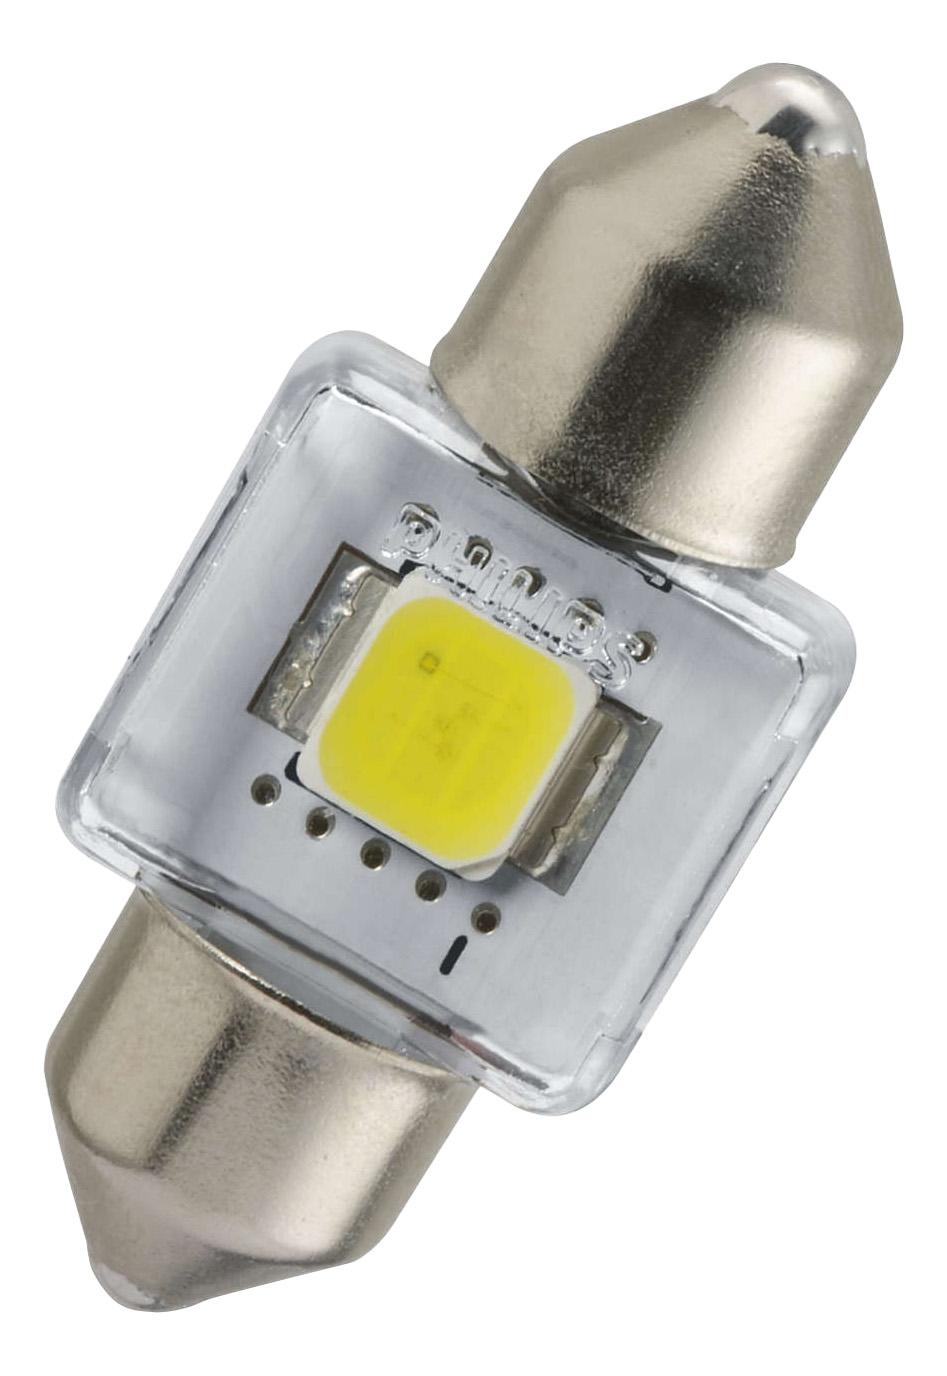 Лампа светодиодная PHILIPS X-tremeUltinon 1W SV8,5-30/12 129416000KX1 фото